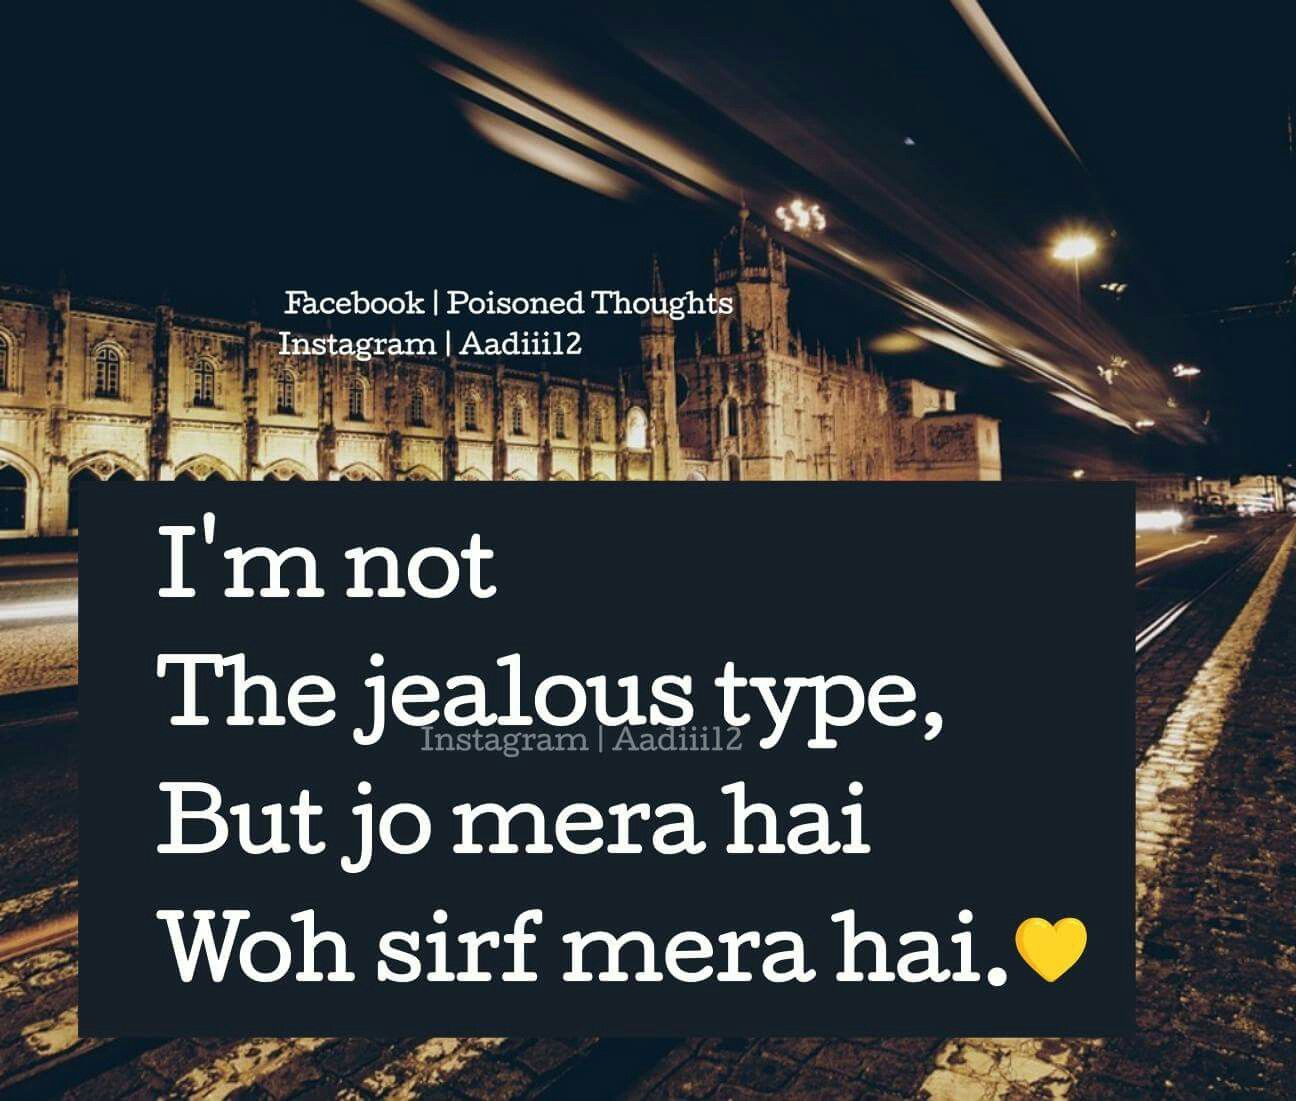 Samjhe Gussa Mat Dilao Dusre Larkiyo Ko Kaam Dekho Zara Jaan A Punjabi Love Quotes Friends Quotes Romantic Poetry